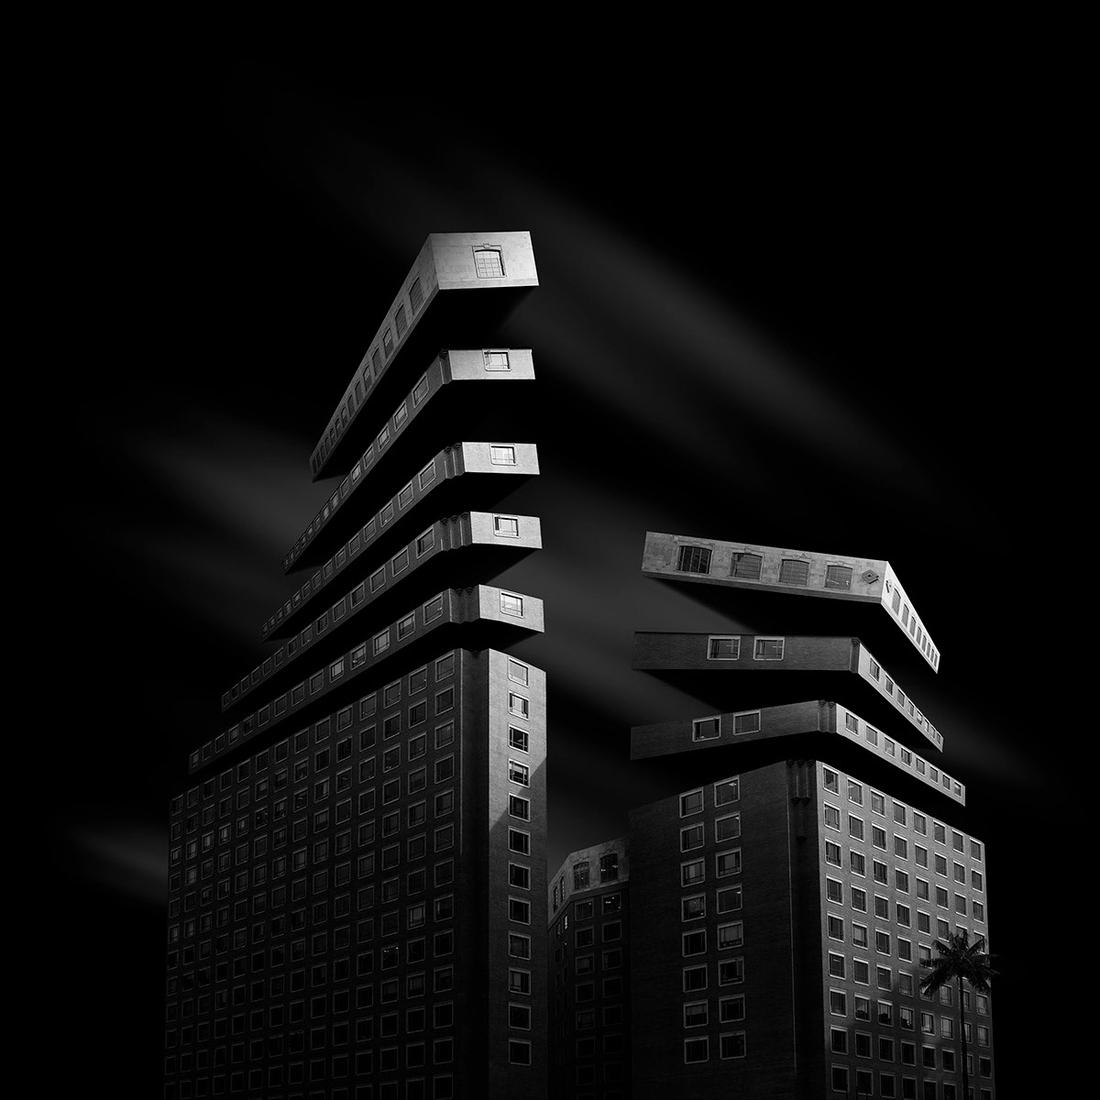 09-Daniel-Garay-Arango-Black-and-White-Surreal-Photographs-Architectural-Deconstruction-www-designstack-co